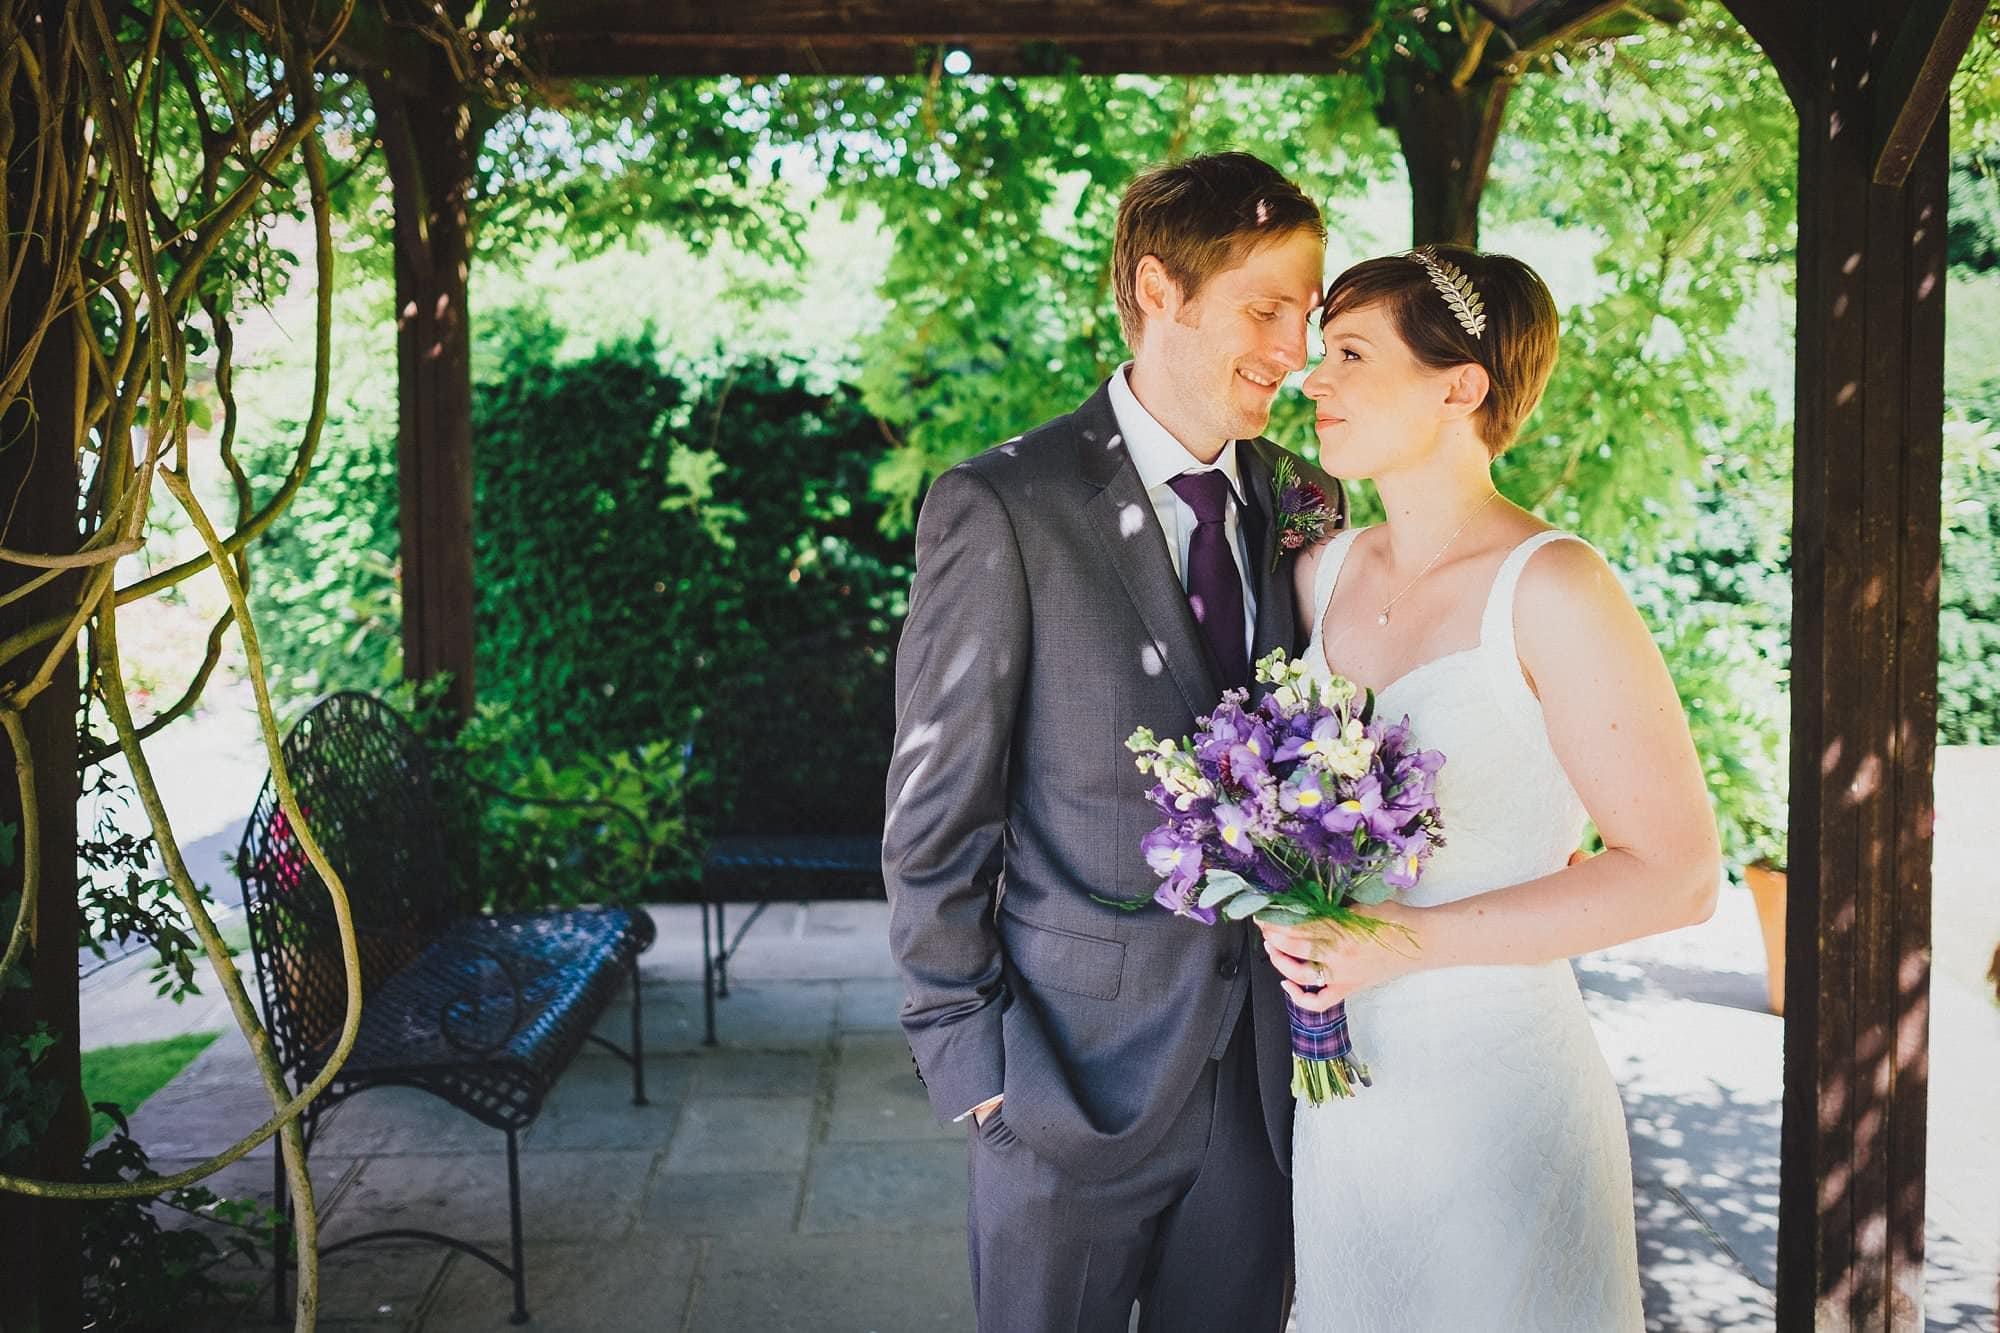 oaks farm wedding photographer cj 057 - Cat + Jake   Oaks Farm Wedding Photography